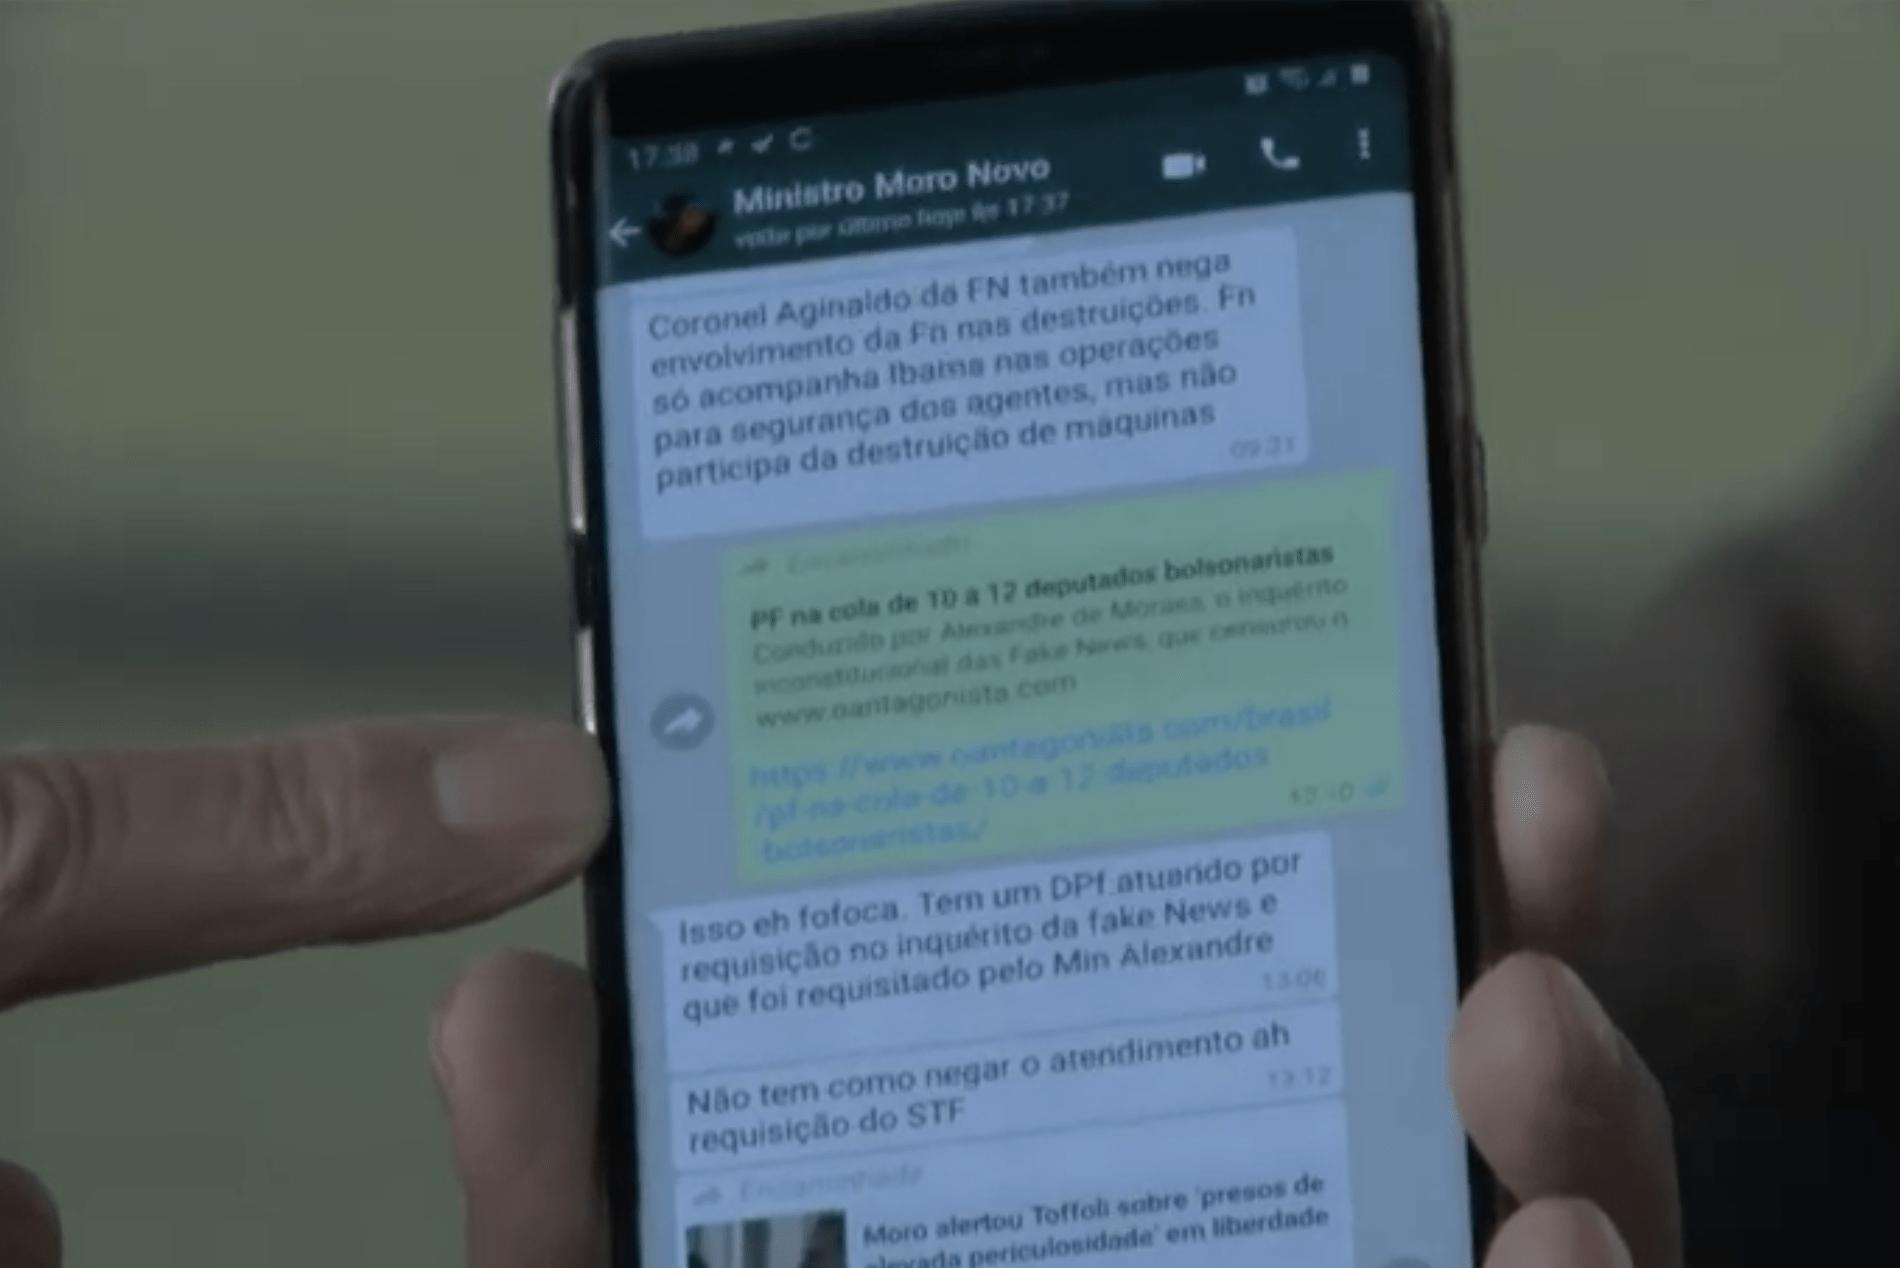 Bolsonaro mostra trecho de conversa com Moro no WhatsApp